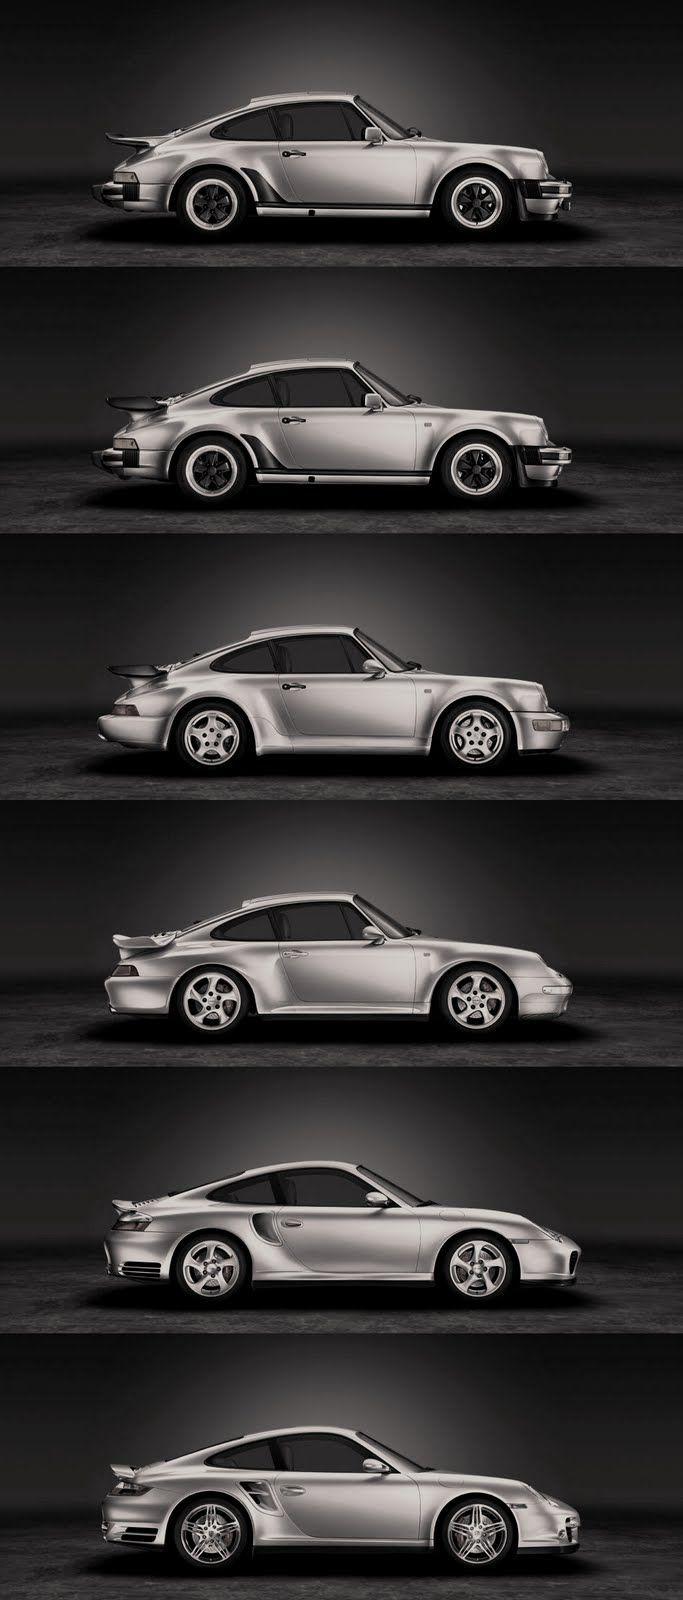 911 Through The Years https://www.amazon.co.uk/Baby-Car-Mirror-Shatterproof-Installation/dp/B06XHG6SSY